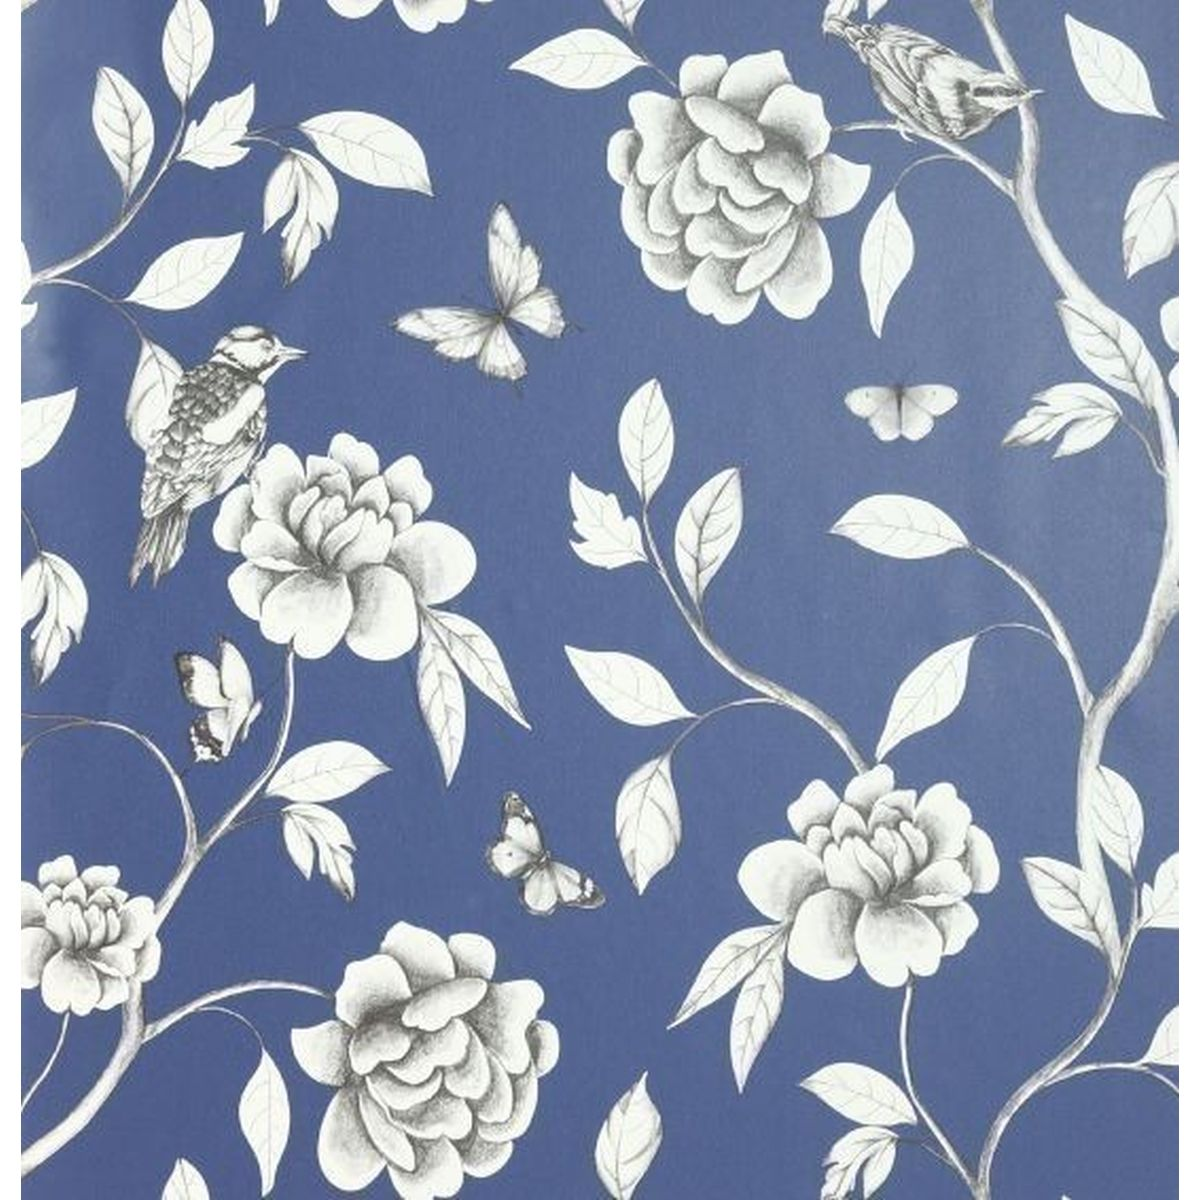 Best of Arthouse Vliestapete Erstklassige Tapete 907600 Blau Blumentapete